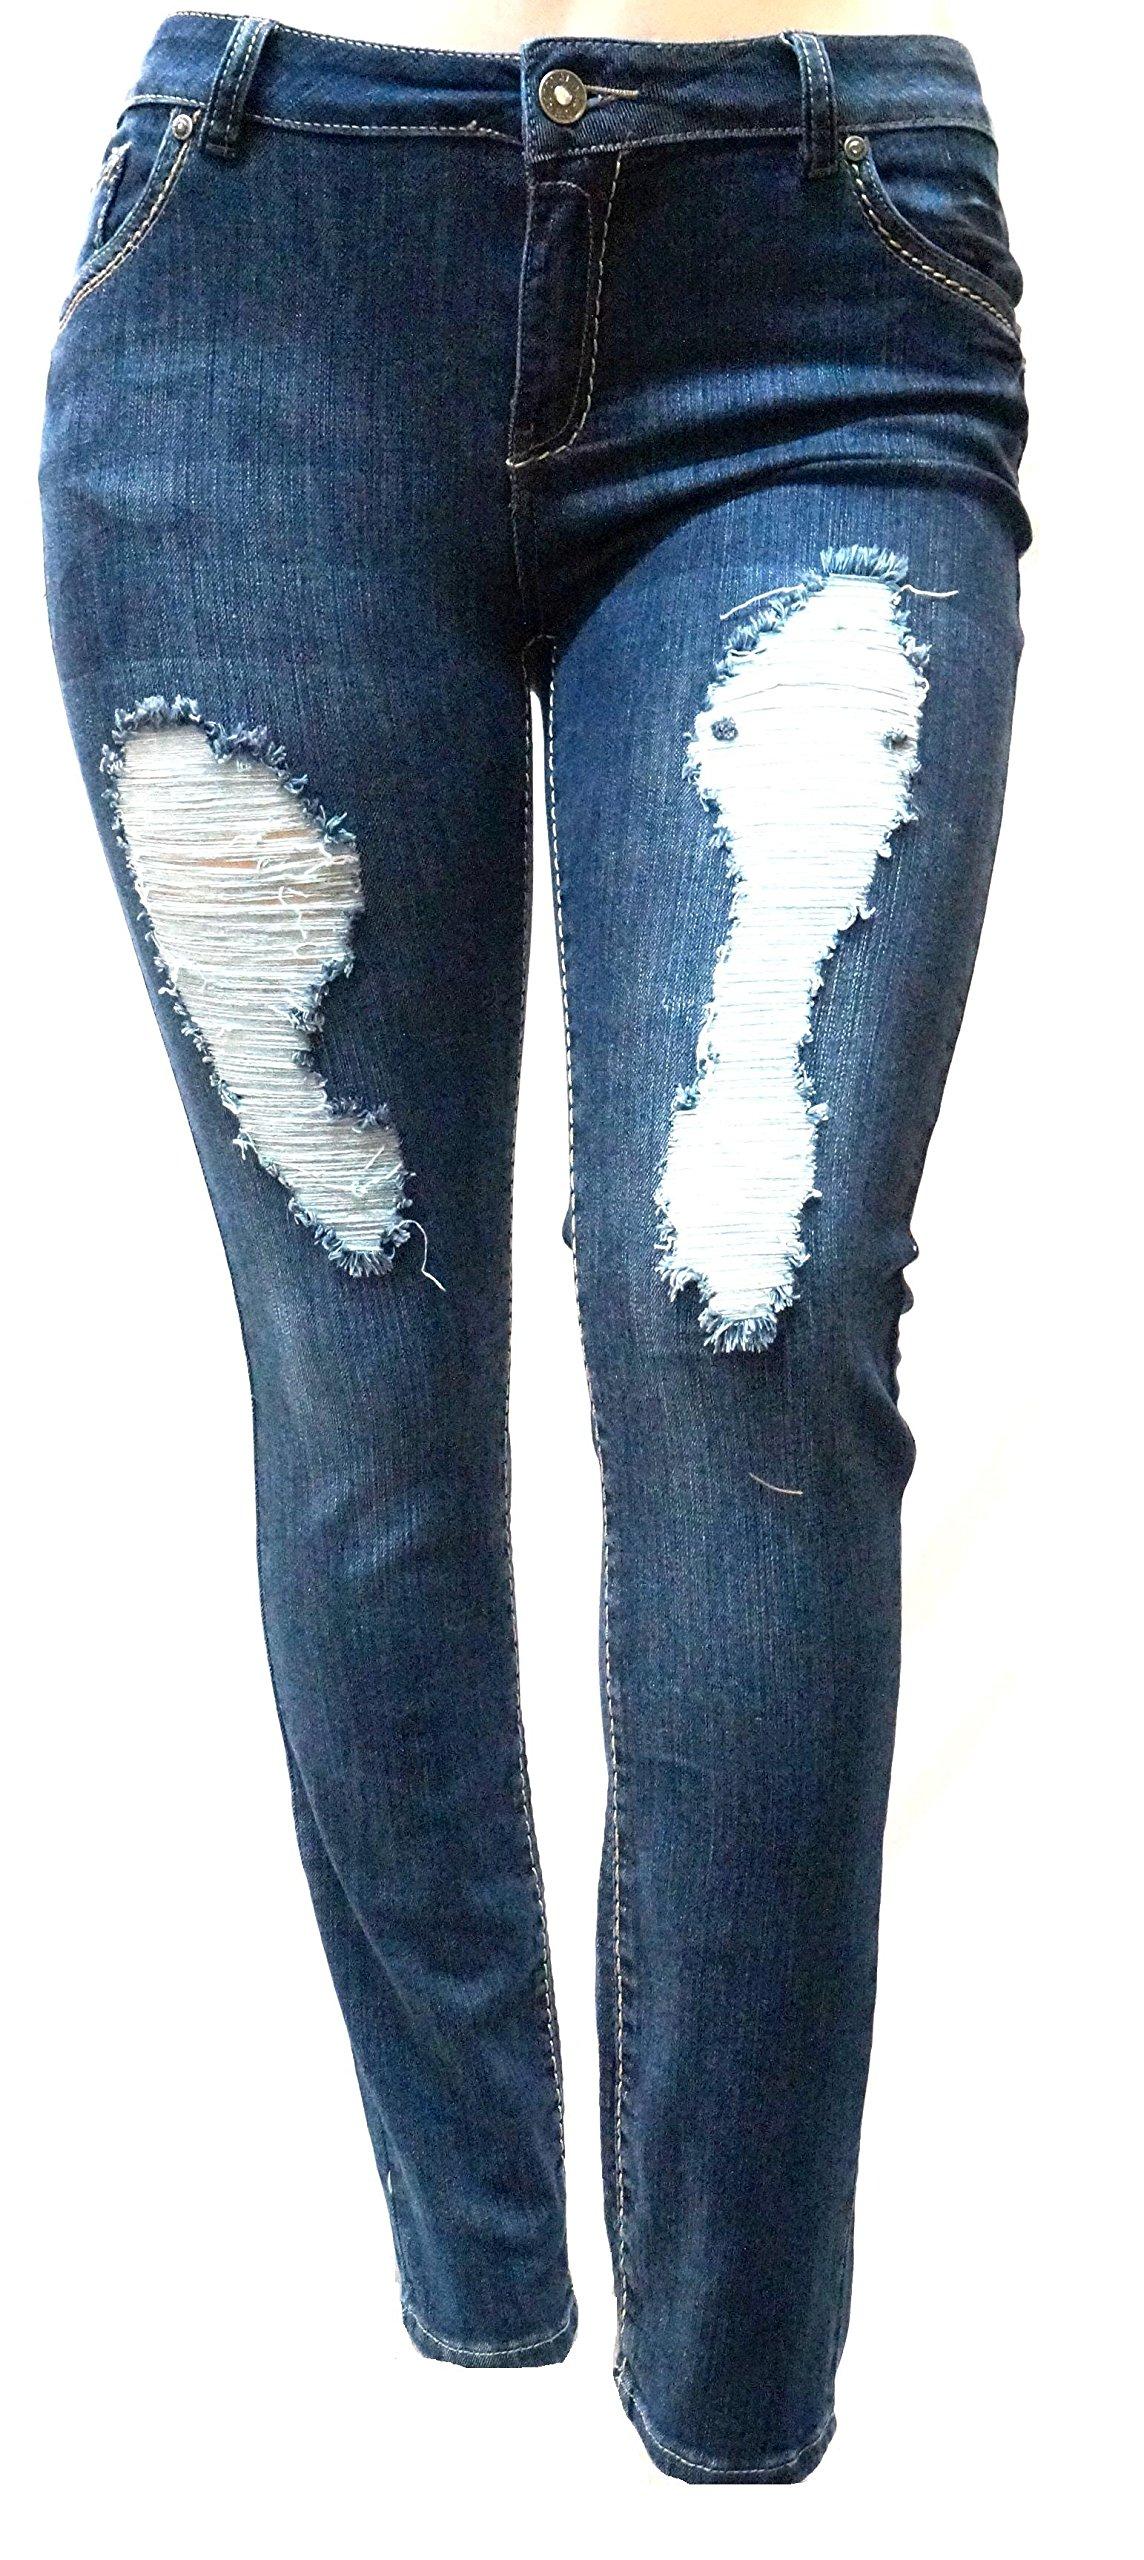 11c9bdce520 Galleon - 1826 WOMENS PLUS SIZE Distressed Ripped Destroy BLUE DENIM JEANS  Skinny PANTS (14)